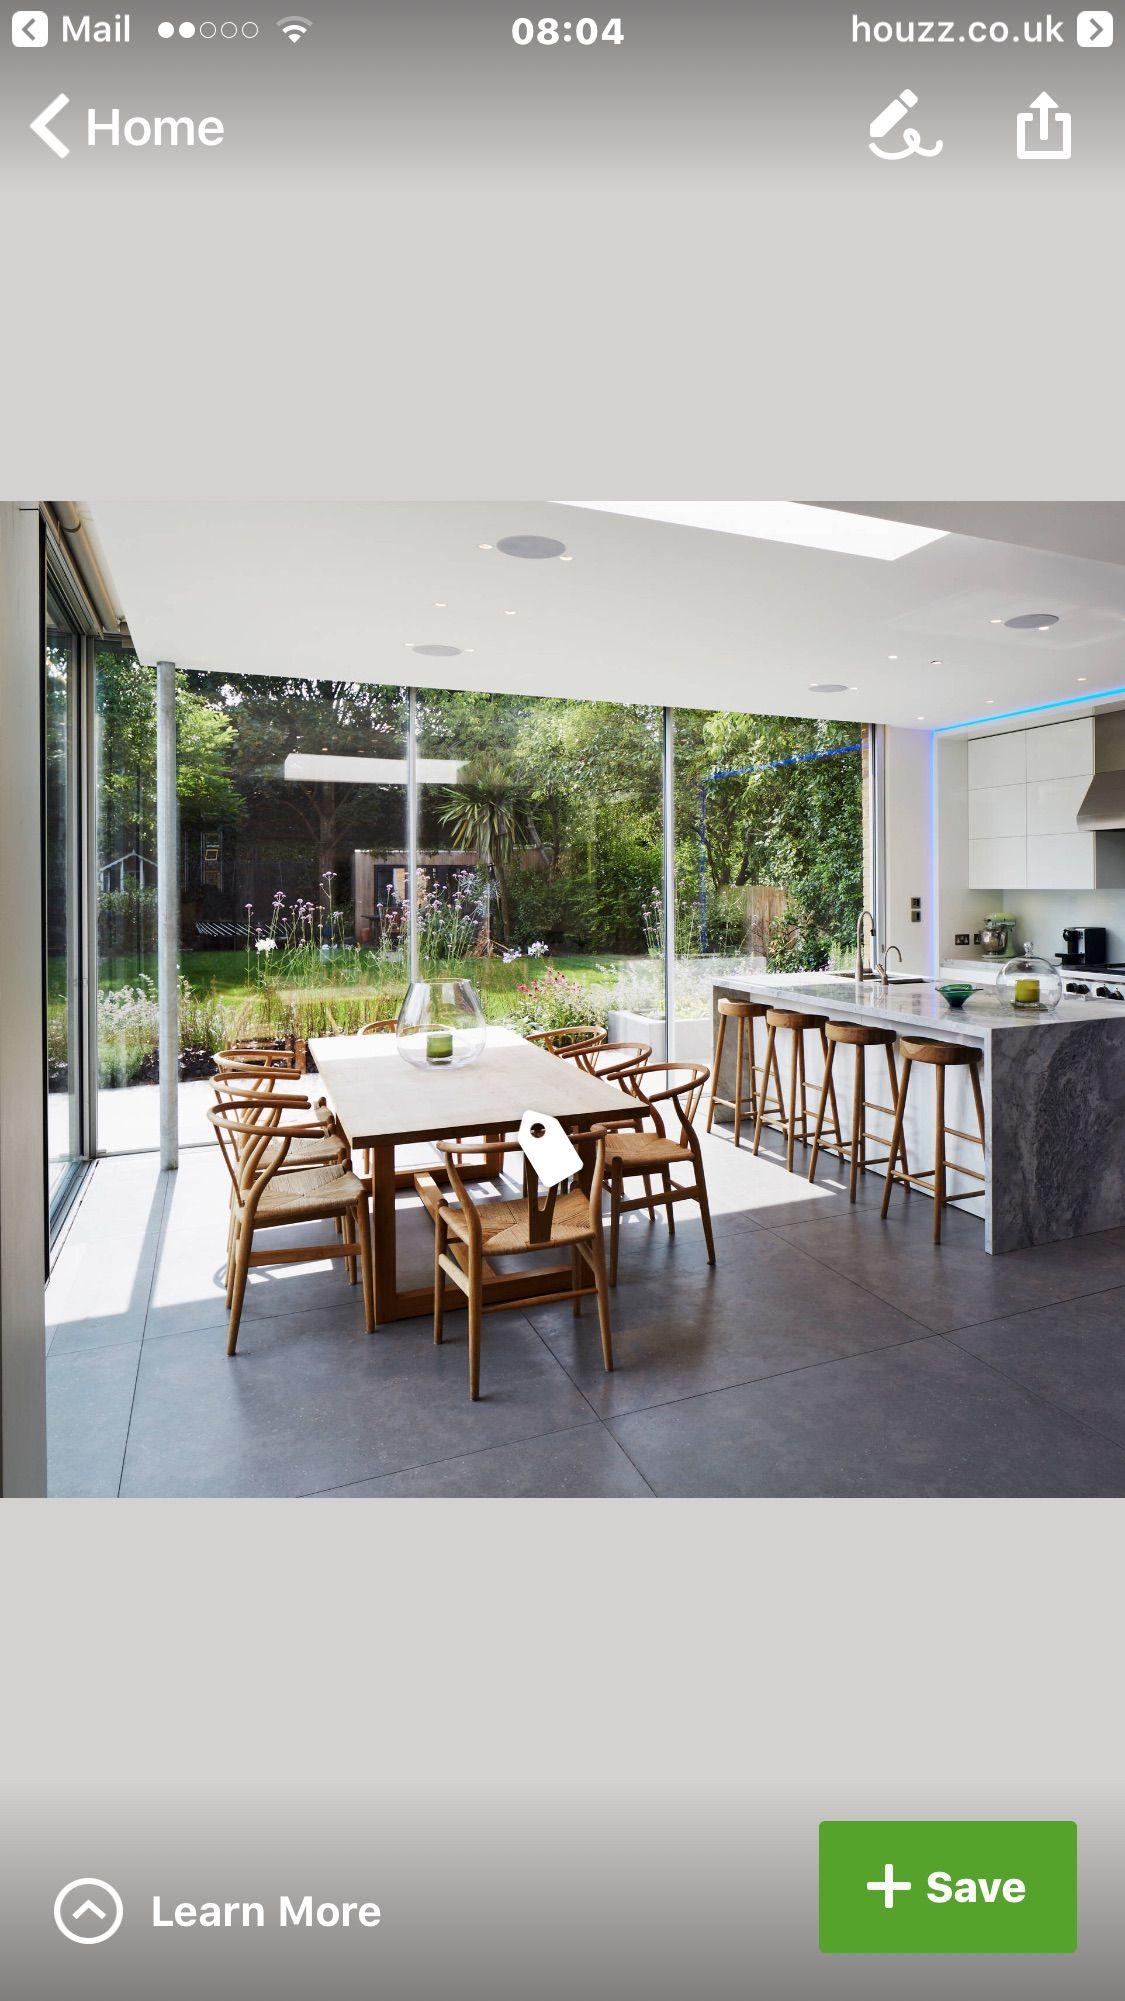 Pin by elif sağım on mutfak pinterest kitchen design and kitchens